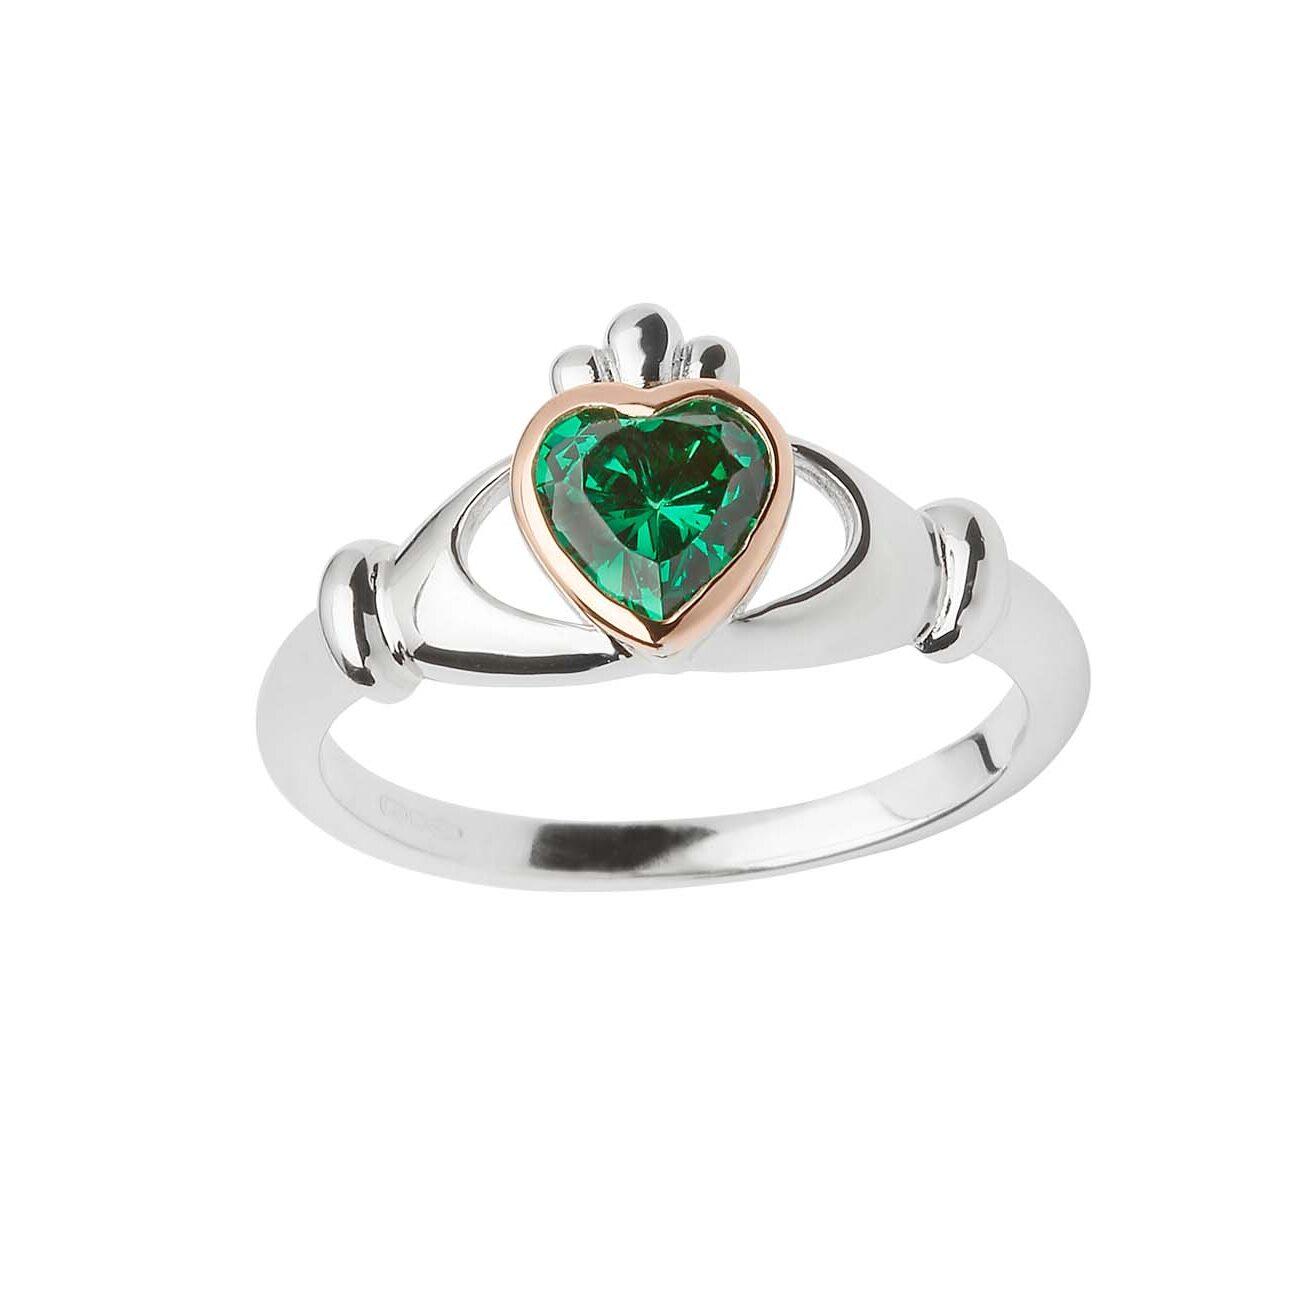 Green Stone Claddagh Ring